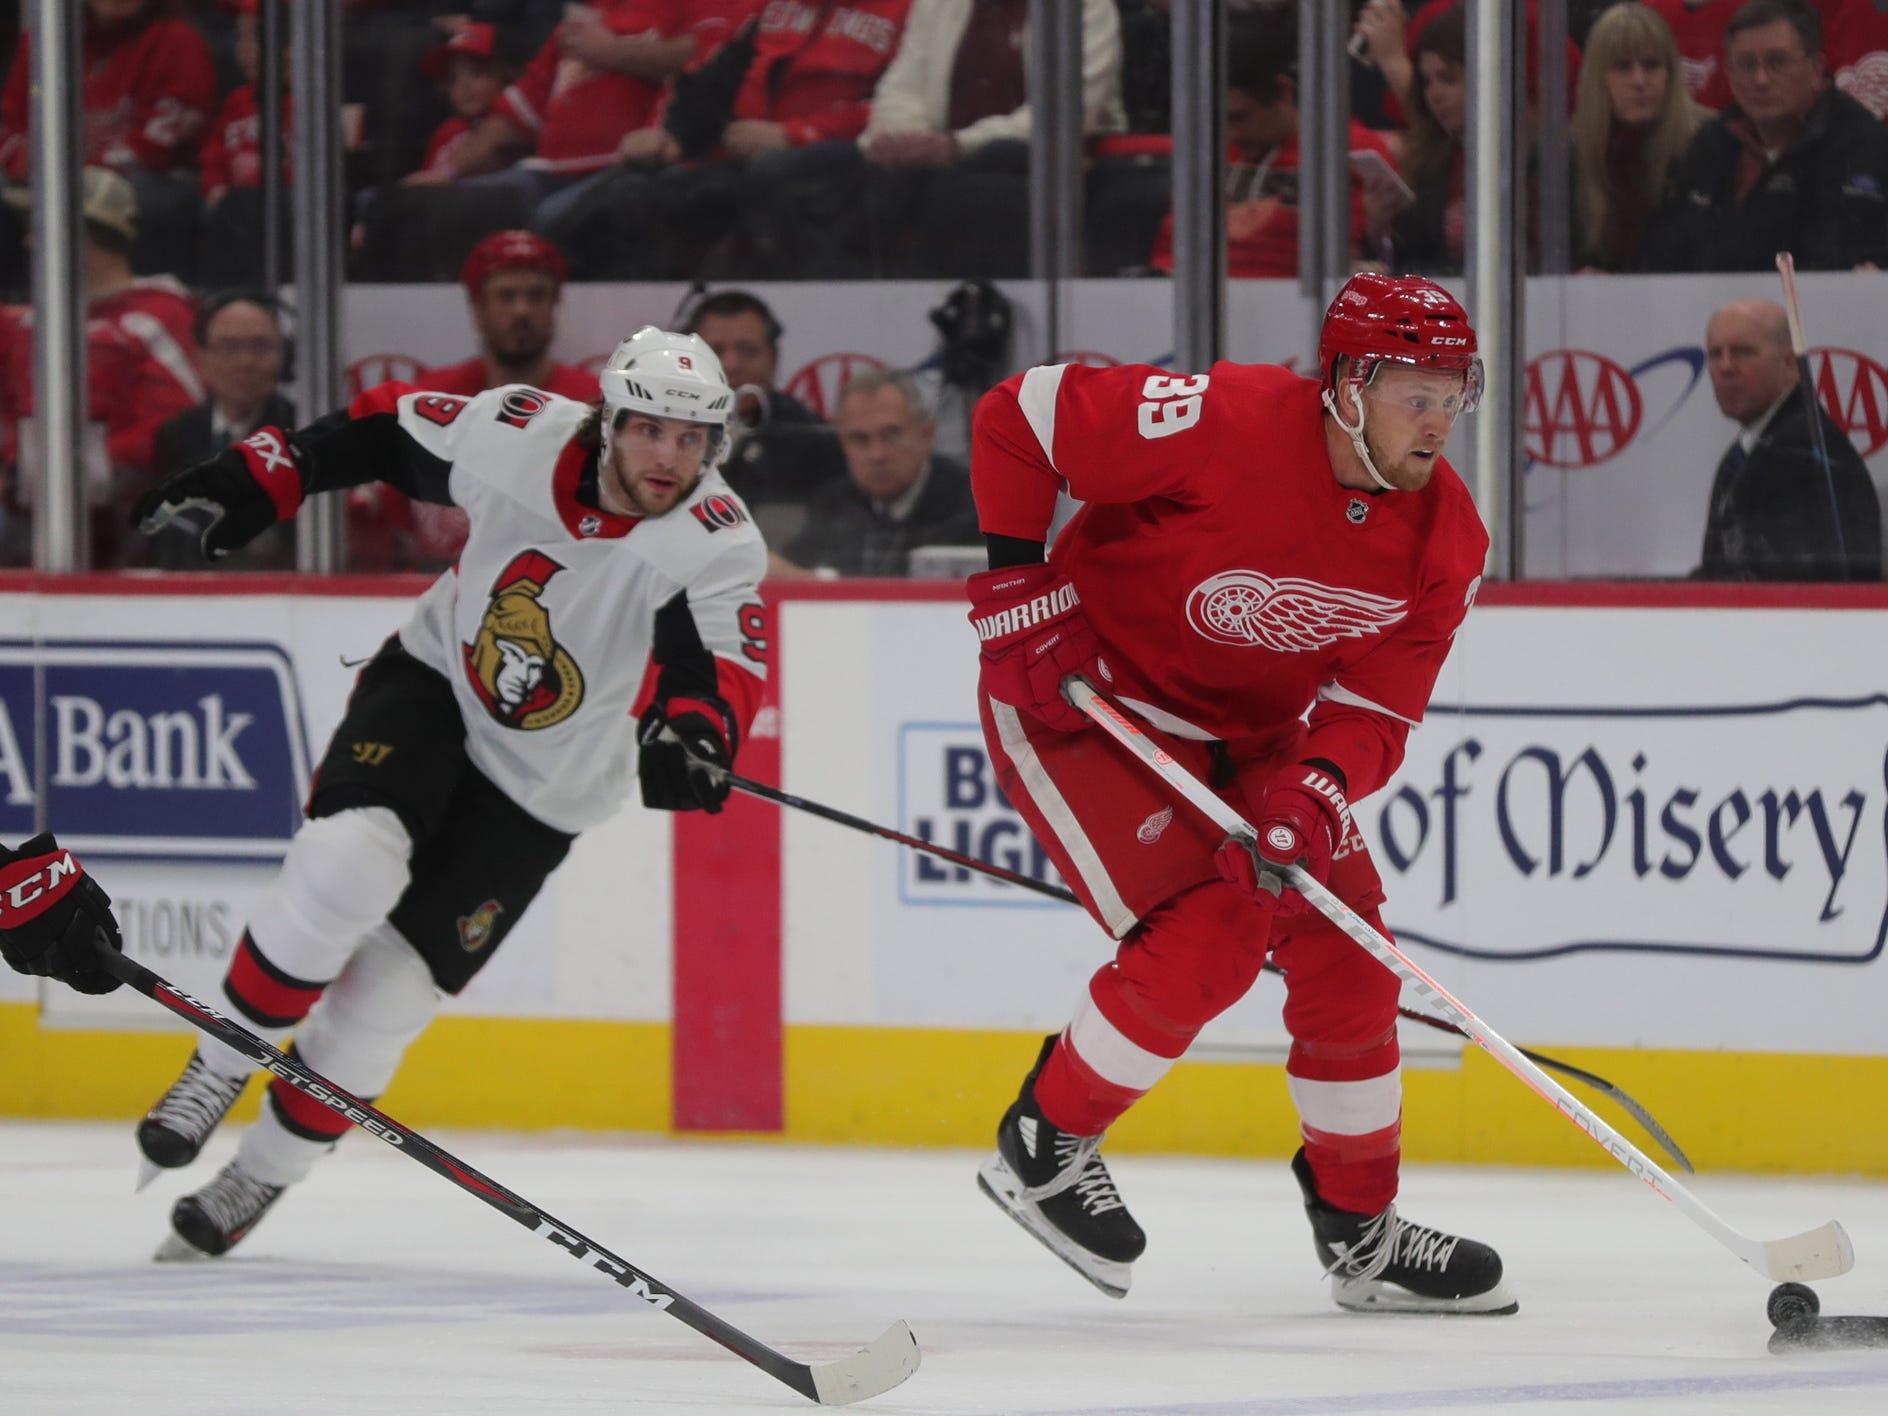 Anthony Mantha skates against the Ottawa Senators on Thursday, Feb. 14, 2019 at Little Caesars Arena in Detroit. The Red Wings won, 3-2.